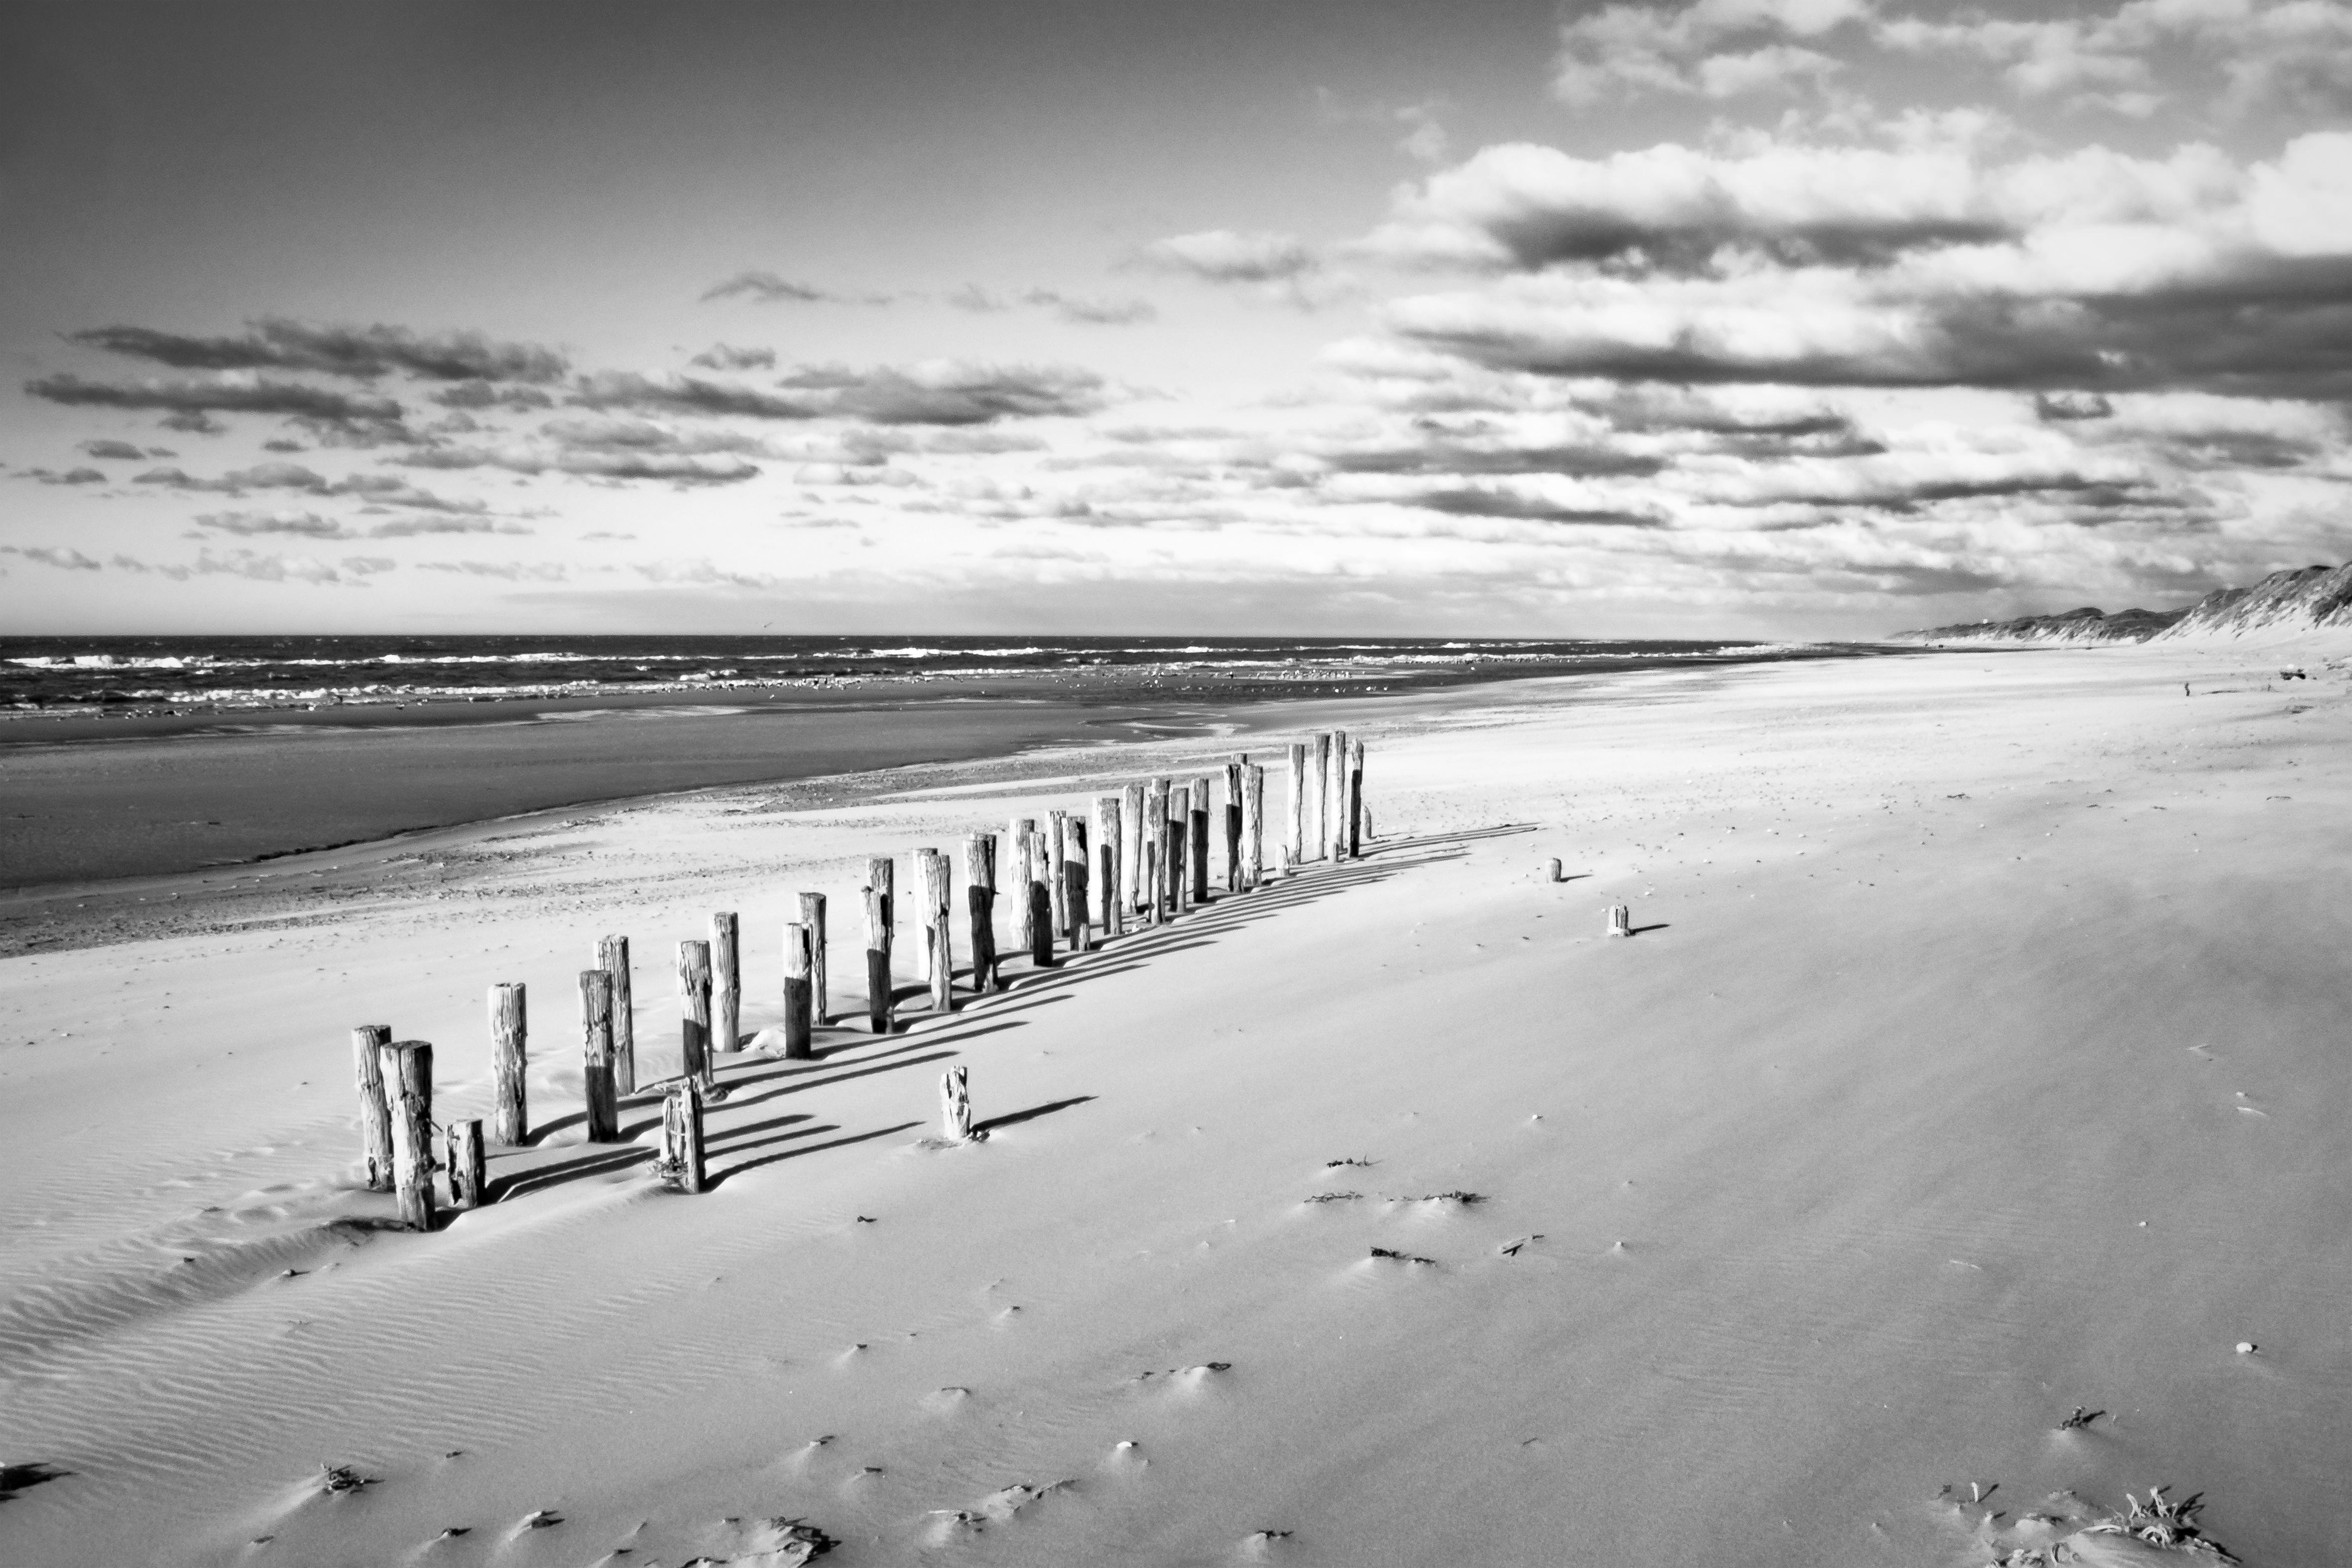 Norlev Strand beach